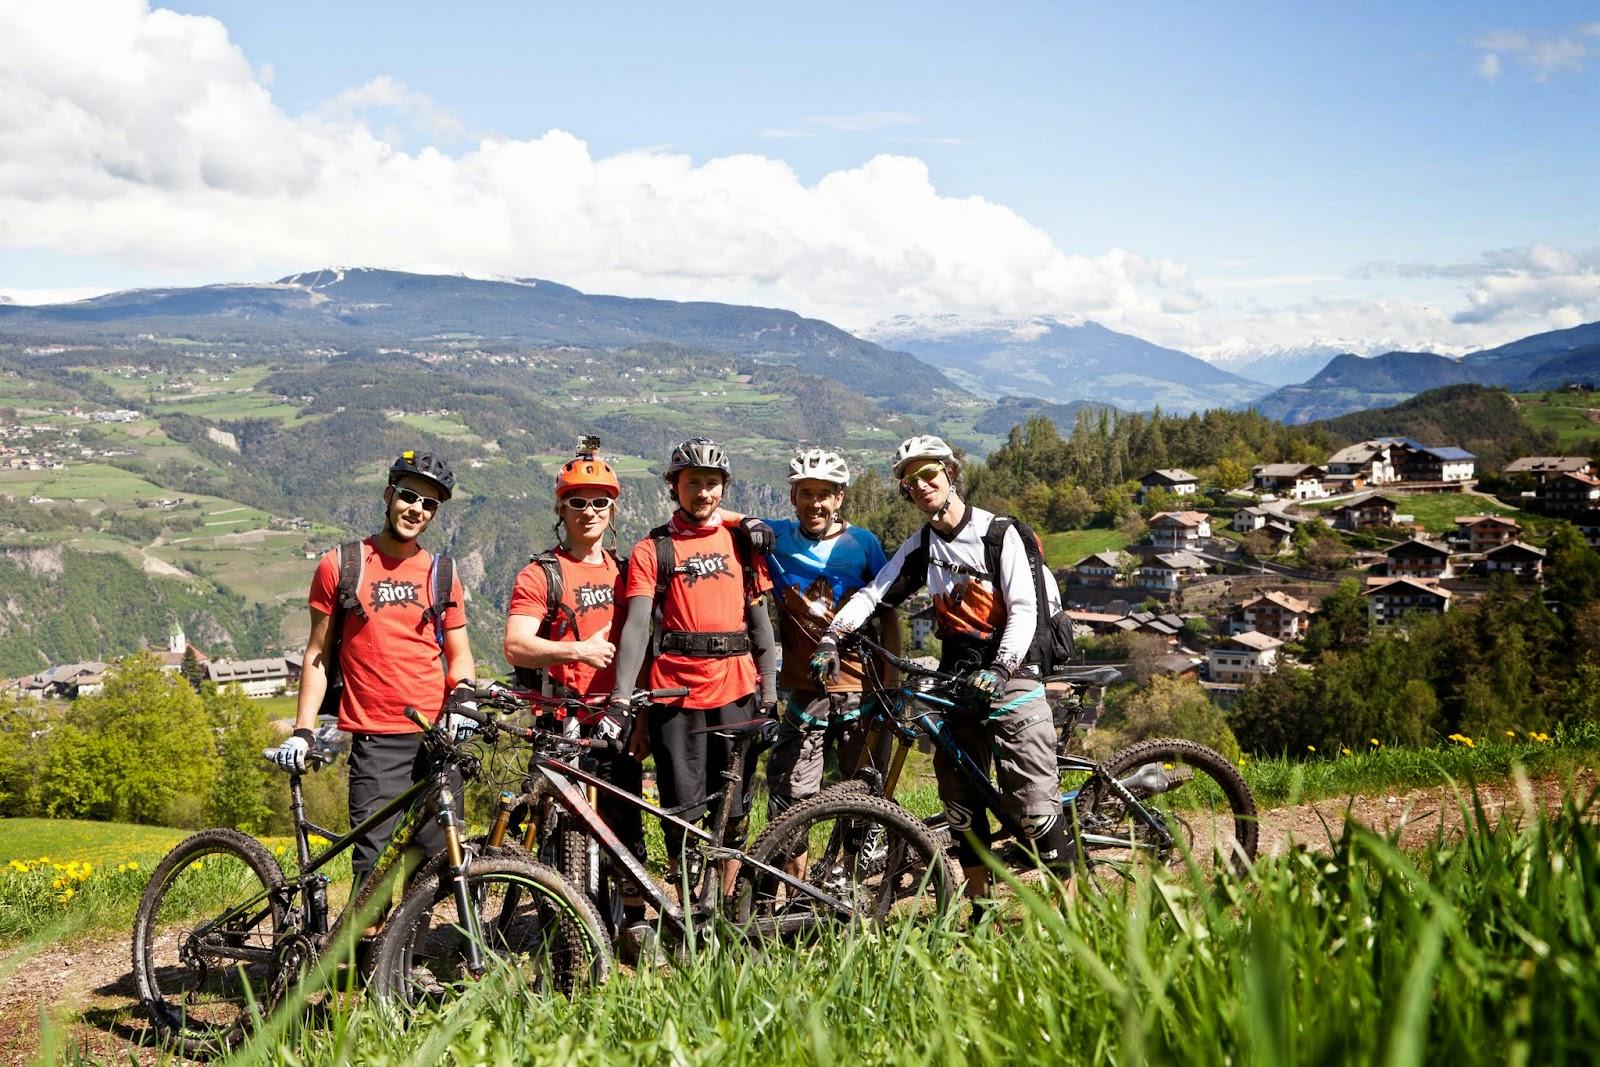 http://www.bikehotel-steineggerhof.com